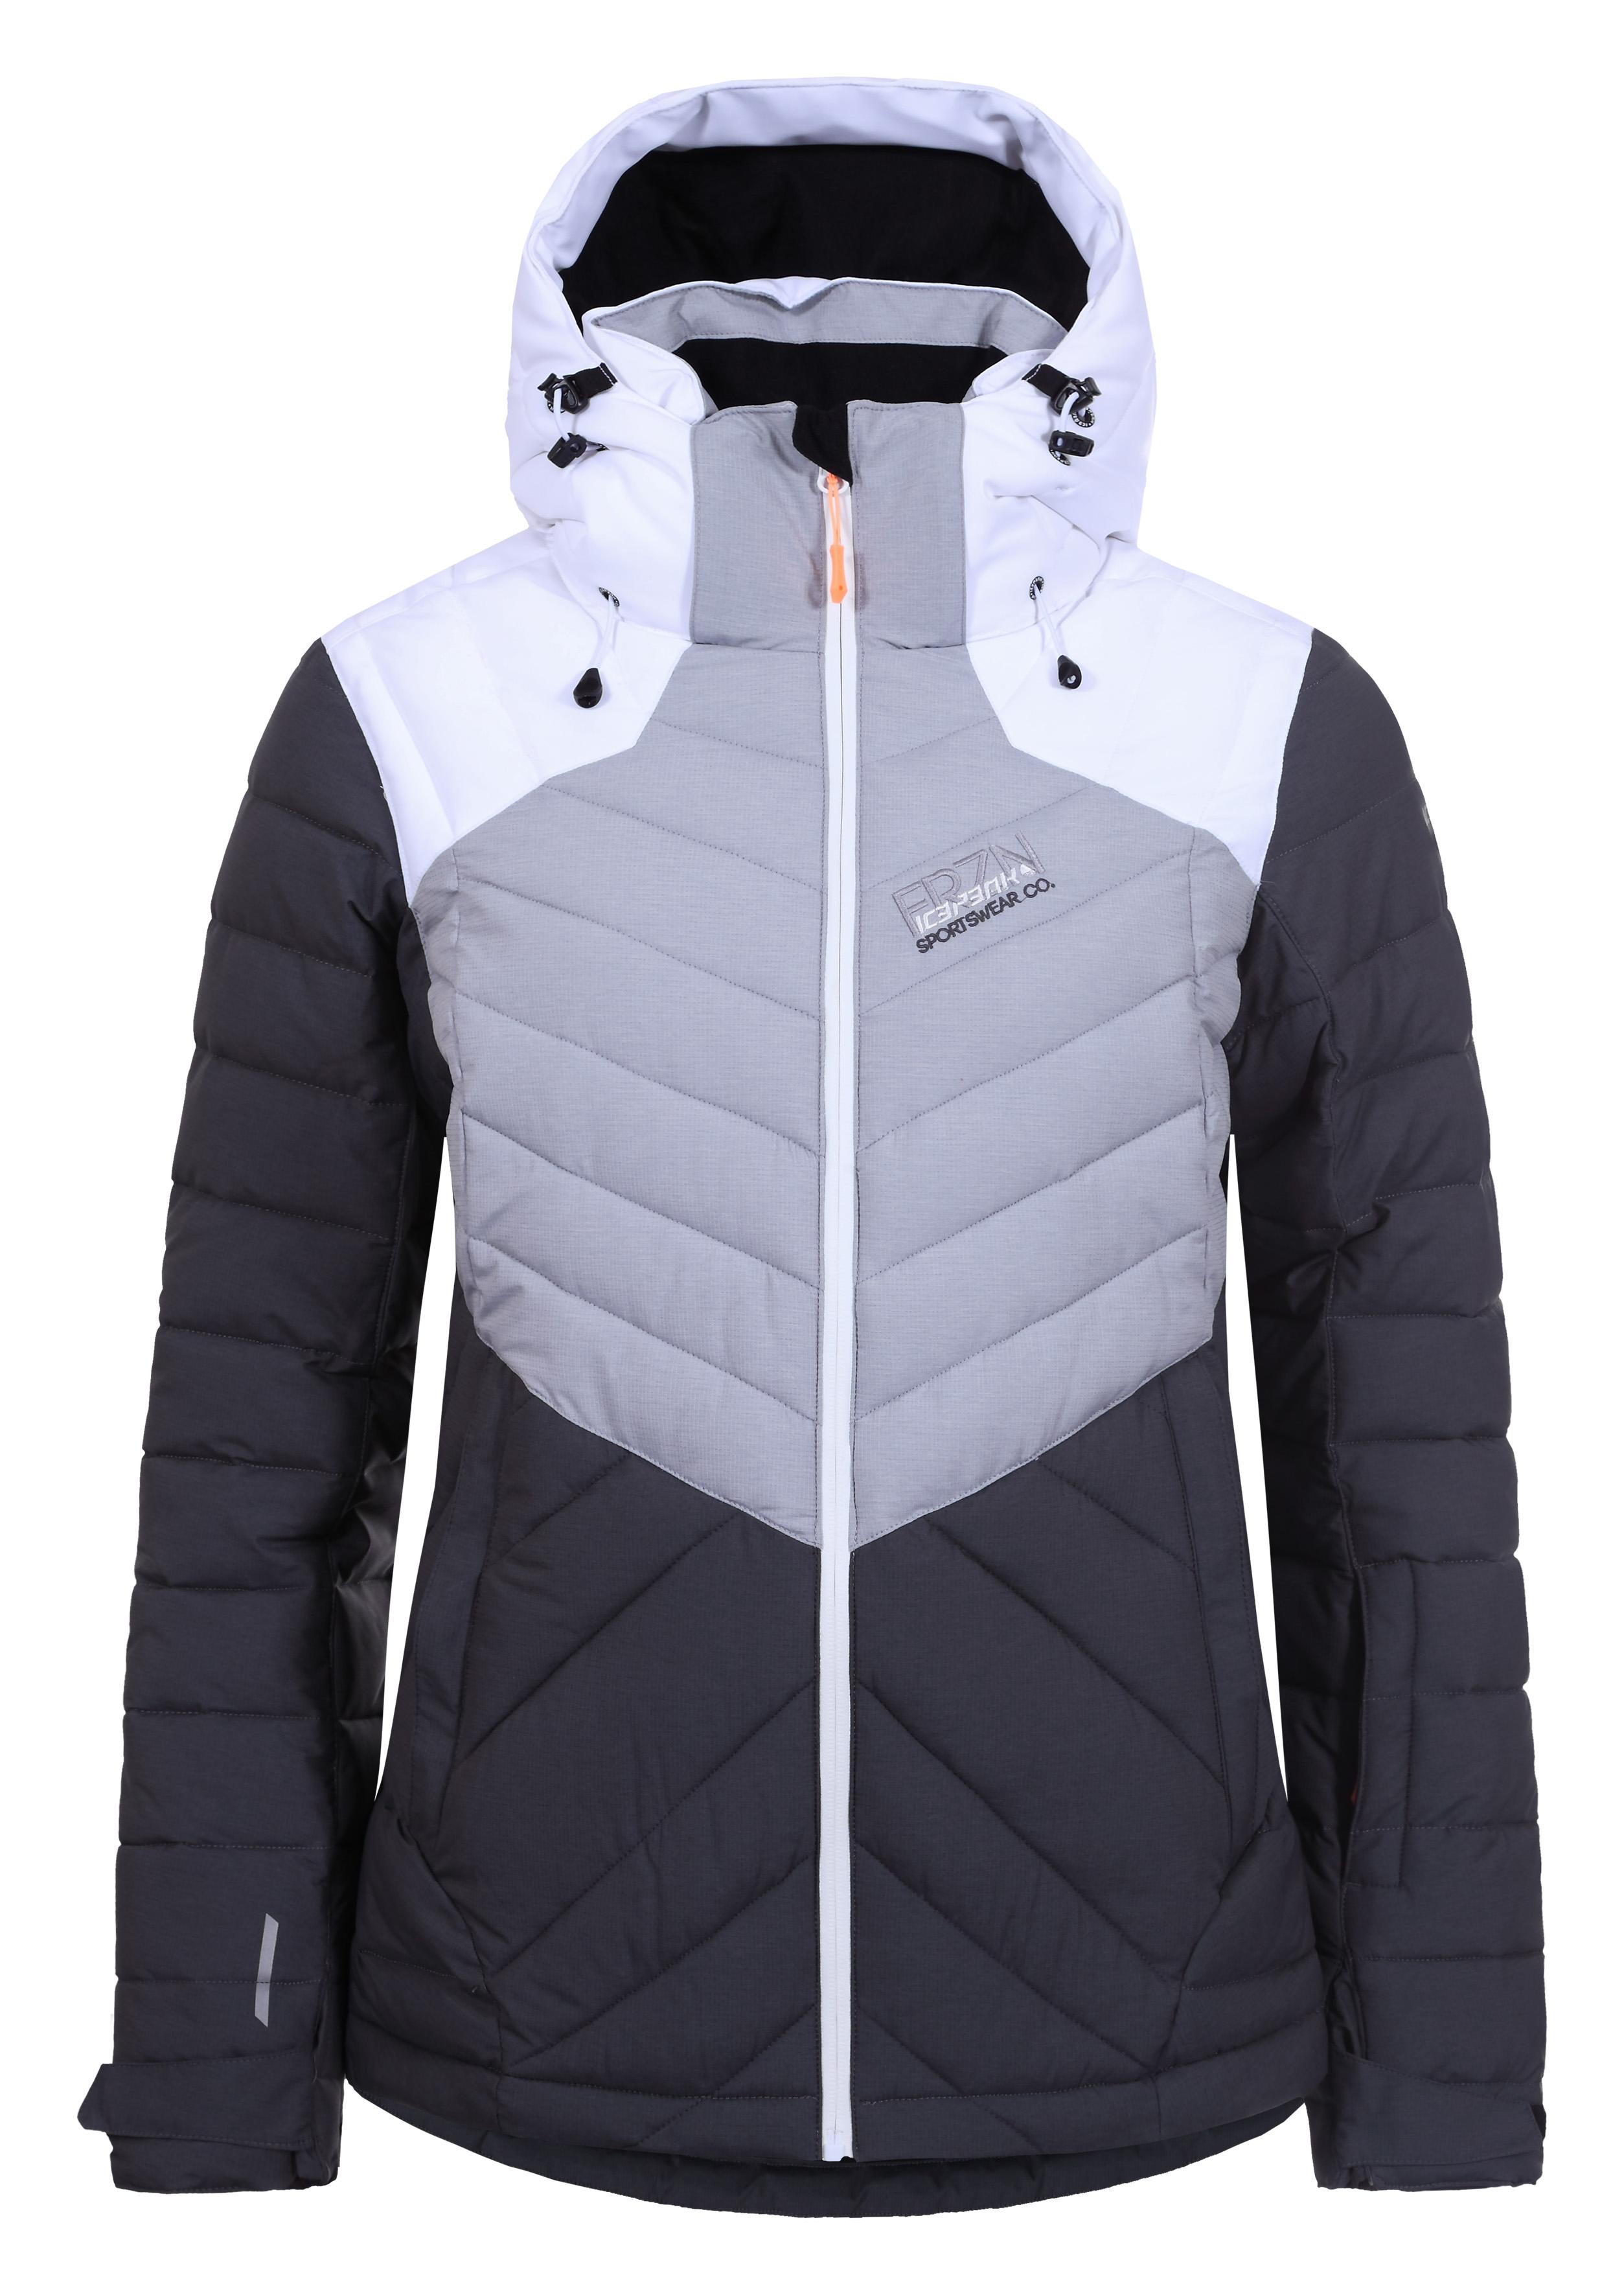 Image of   Icepeak Kendra Outdoor Downlook Jacket women - Black - 40